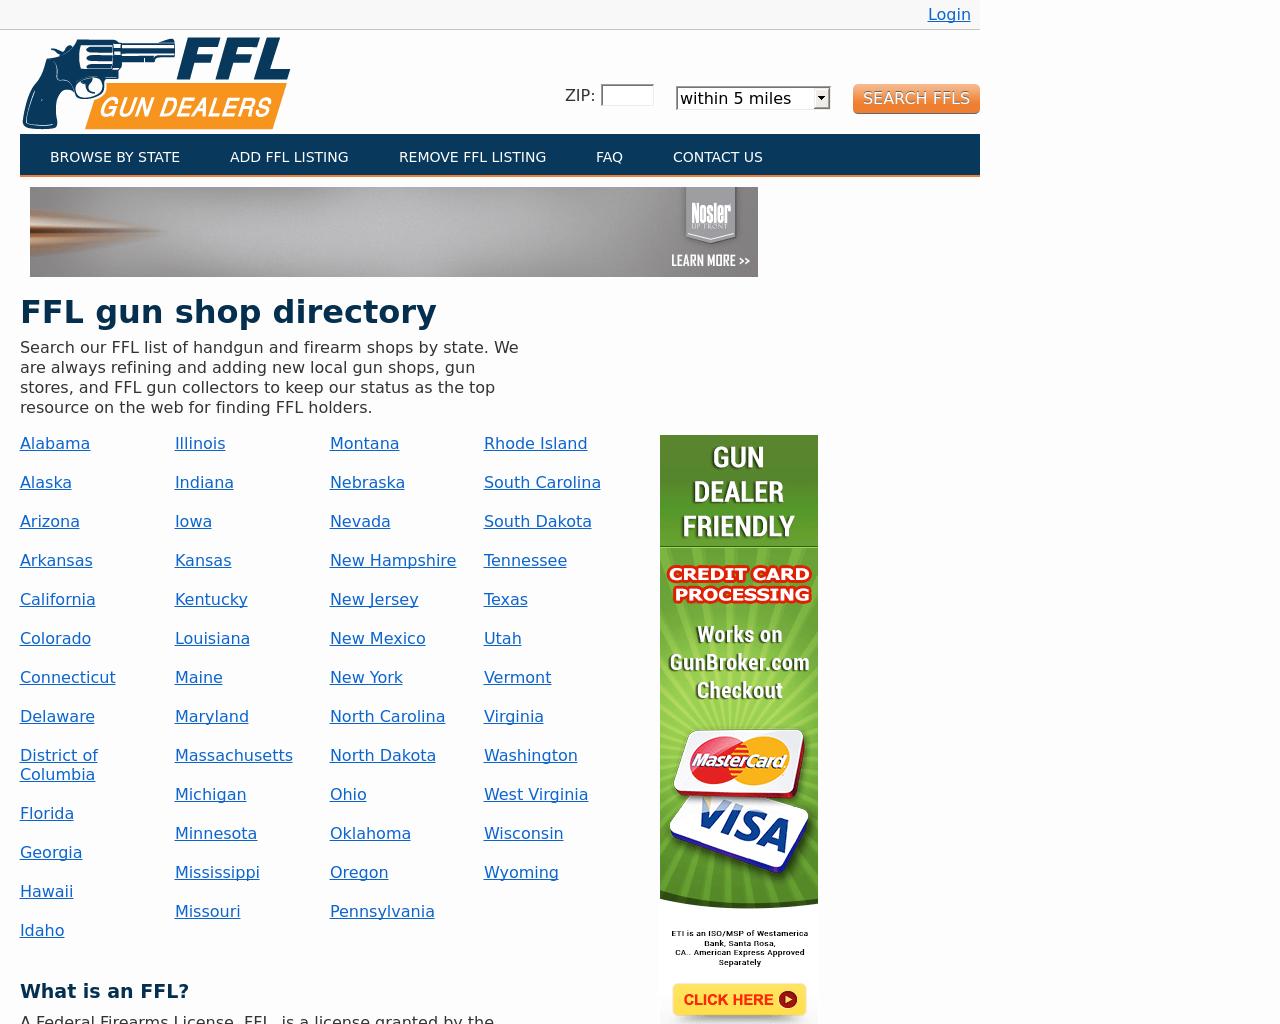 FFL-GUN-DEALERS-Advertising-Reviews-Pricing